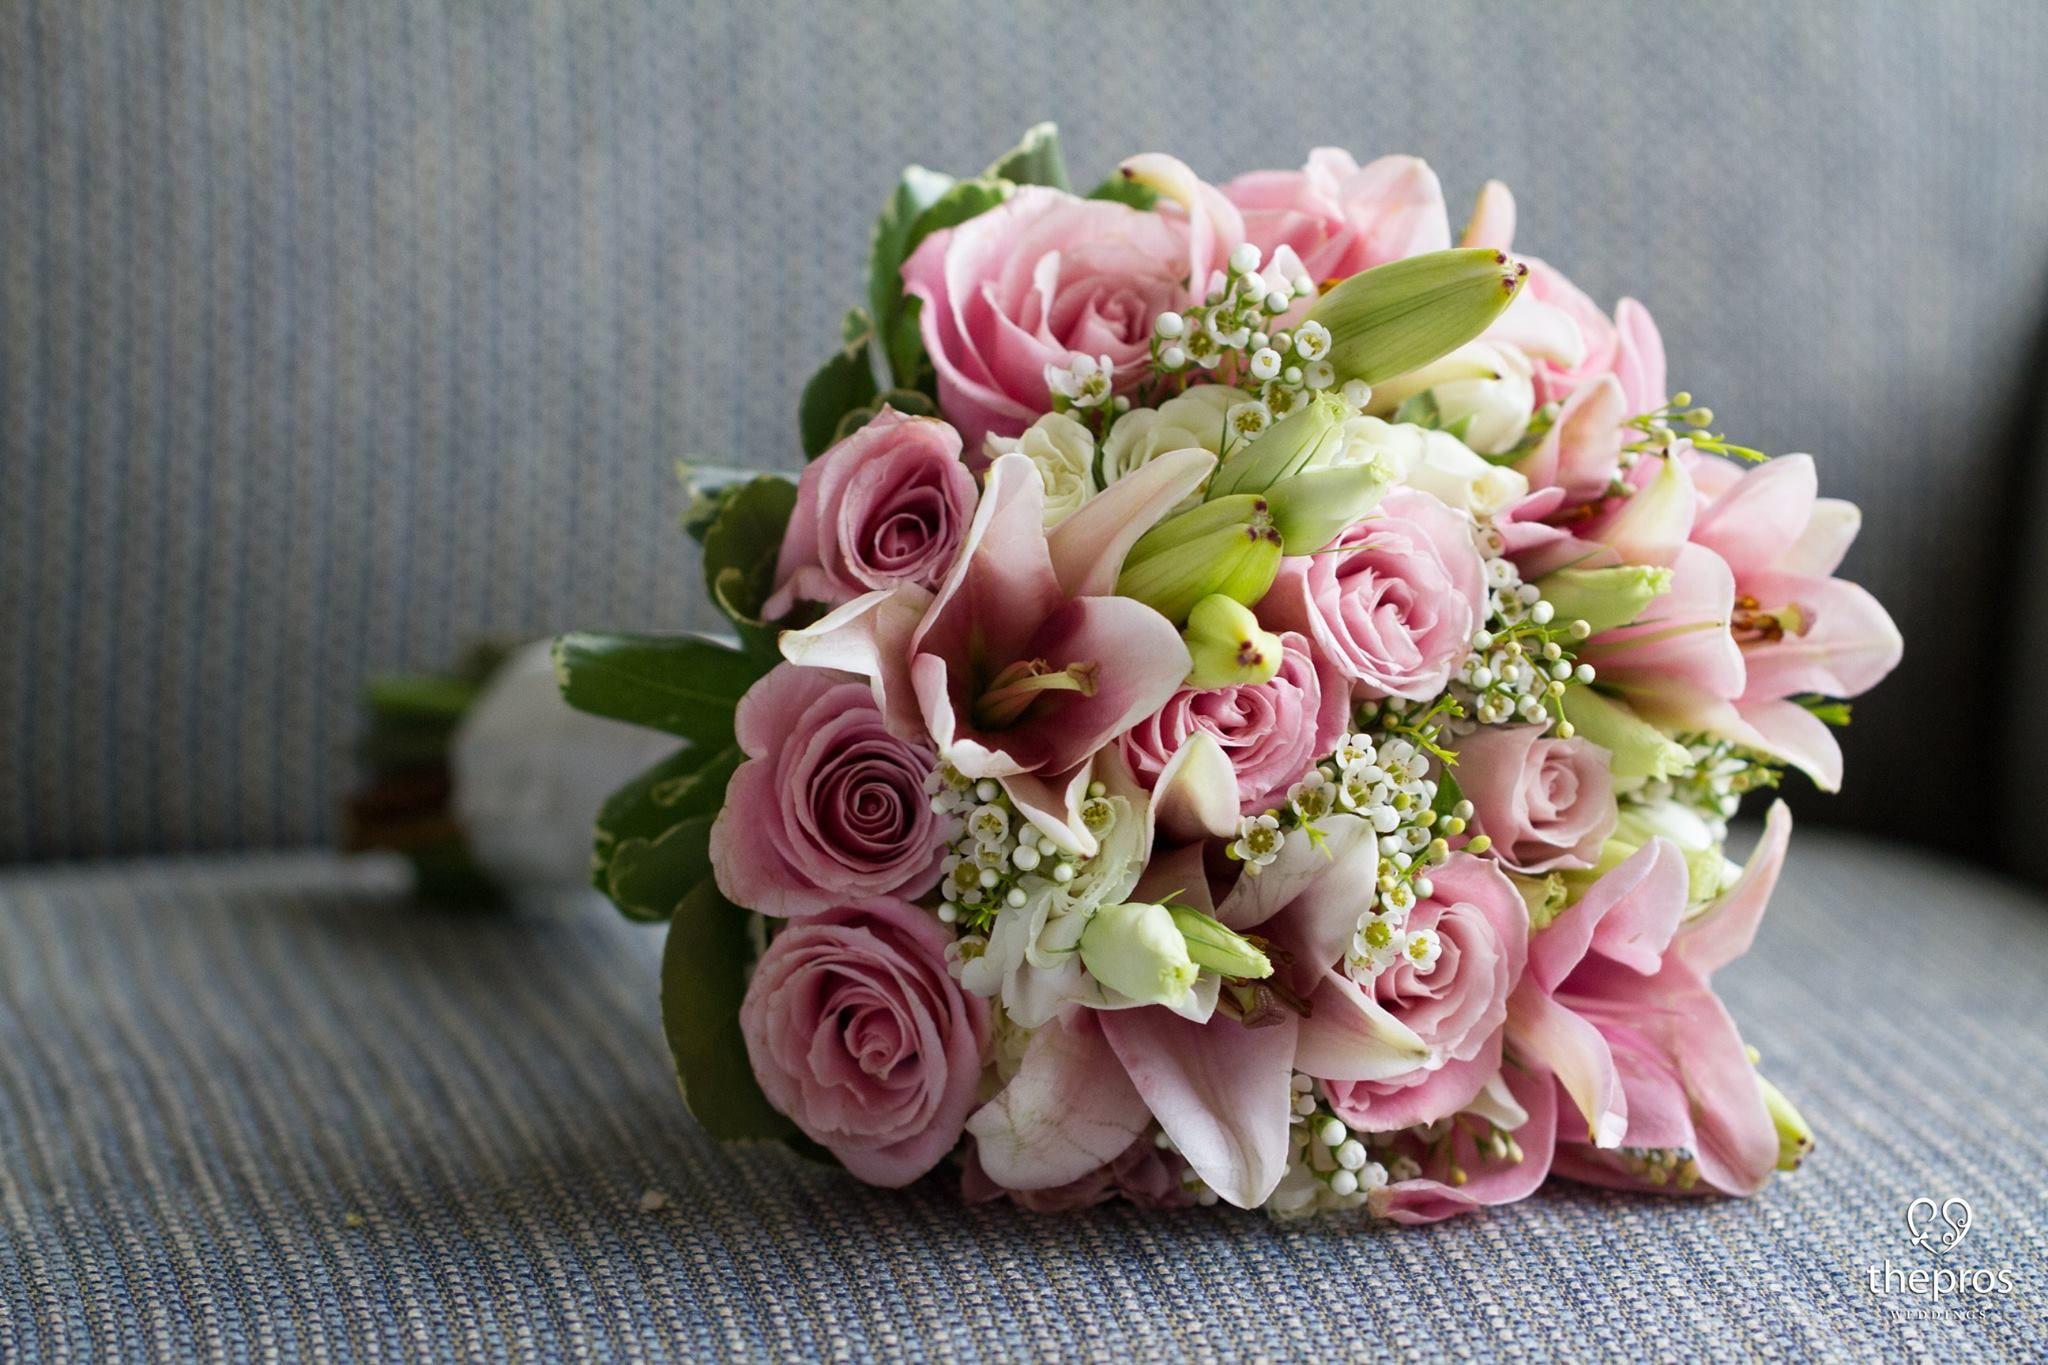 The Pros Weddings Wedding Specials Perfect Wedding Real Weddings